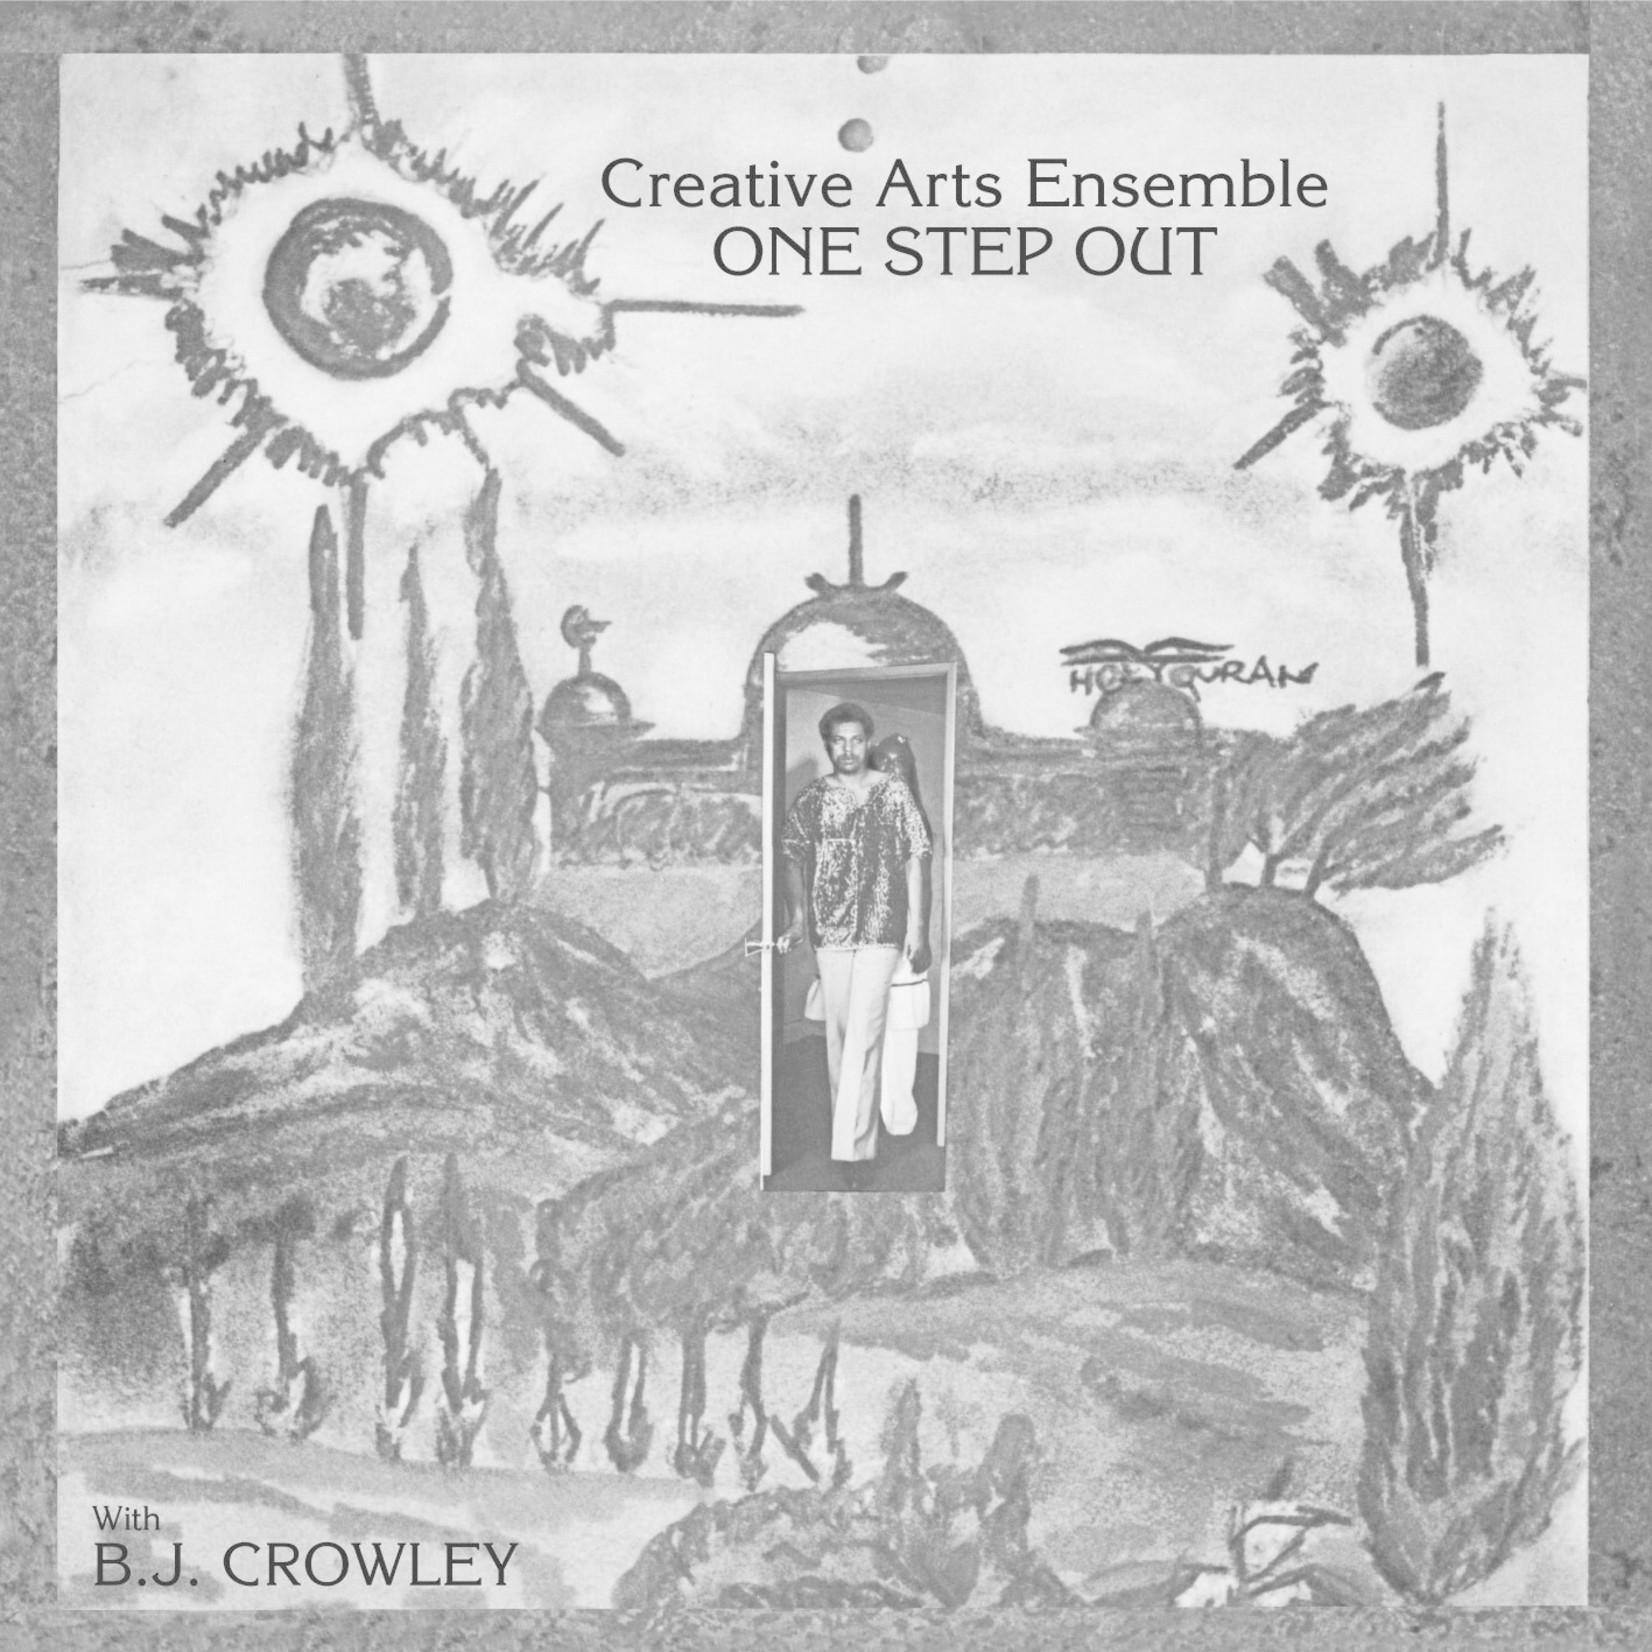 [New] Creative Arts Ensemble: One Step Out (180g)